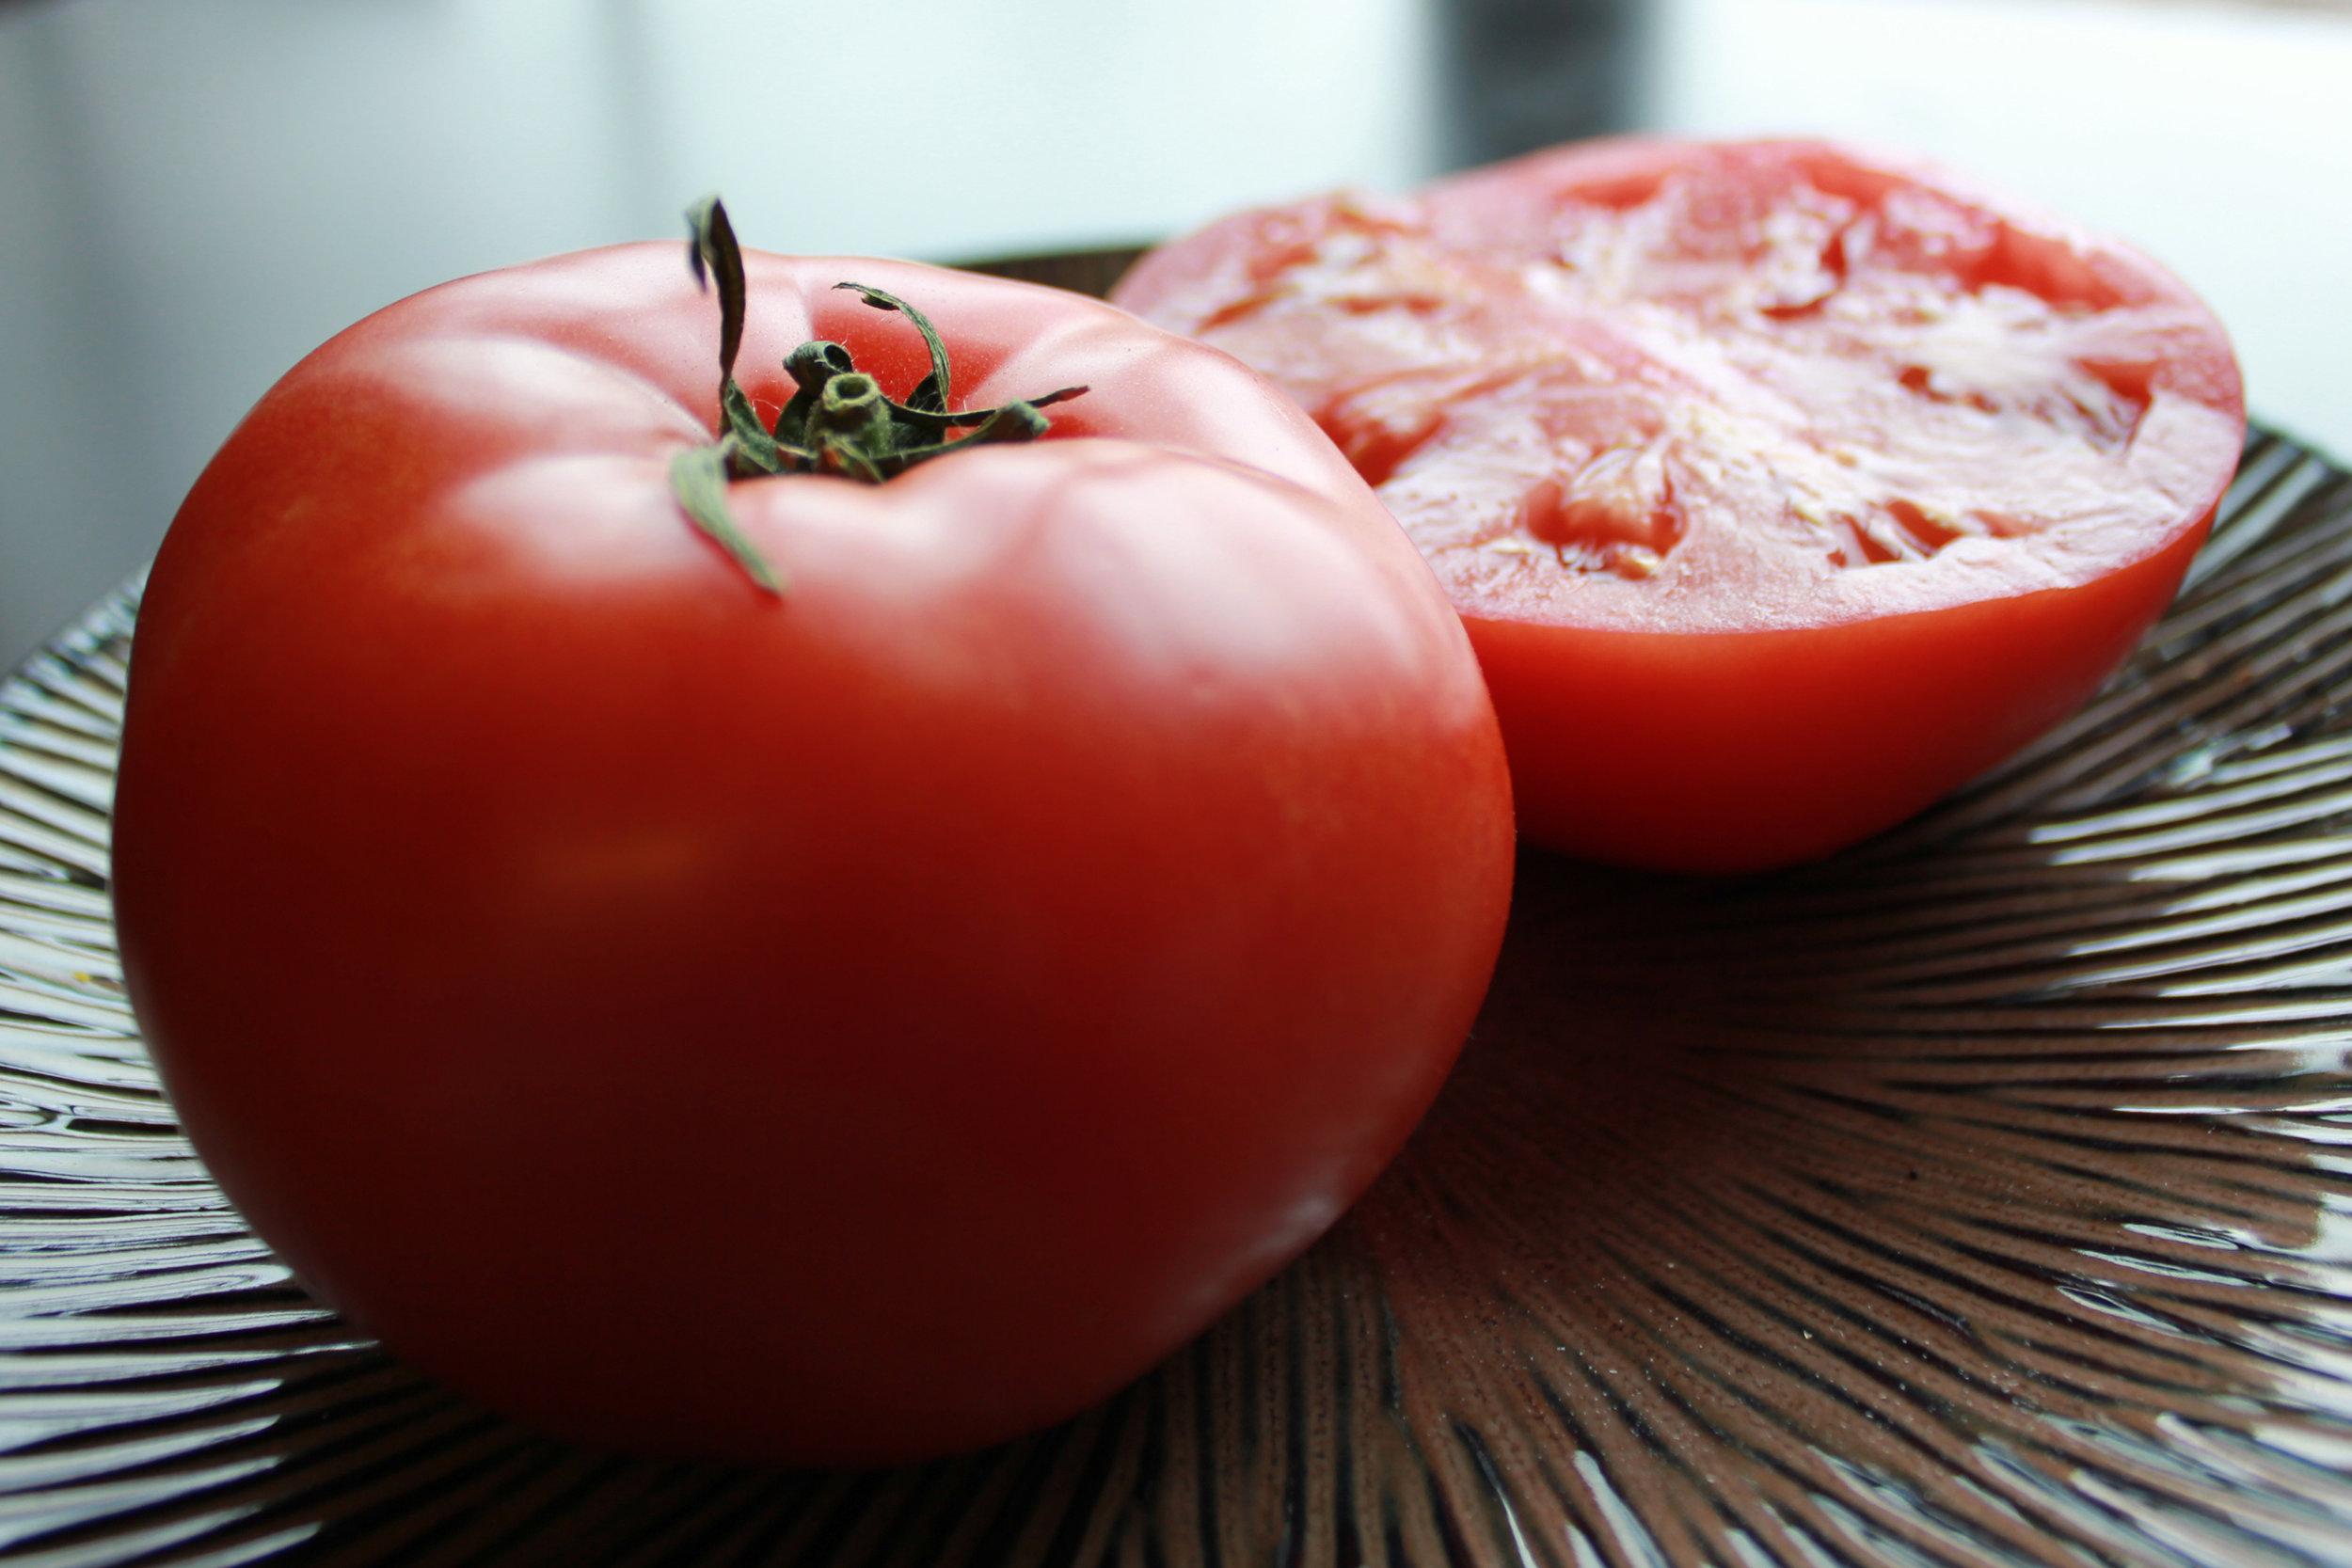 Tomato1-SXC.hu-user-amyability.jpg